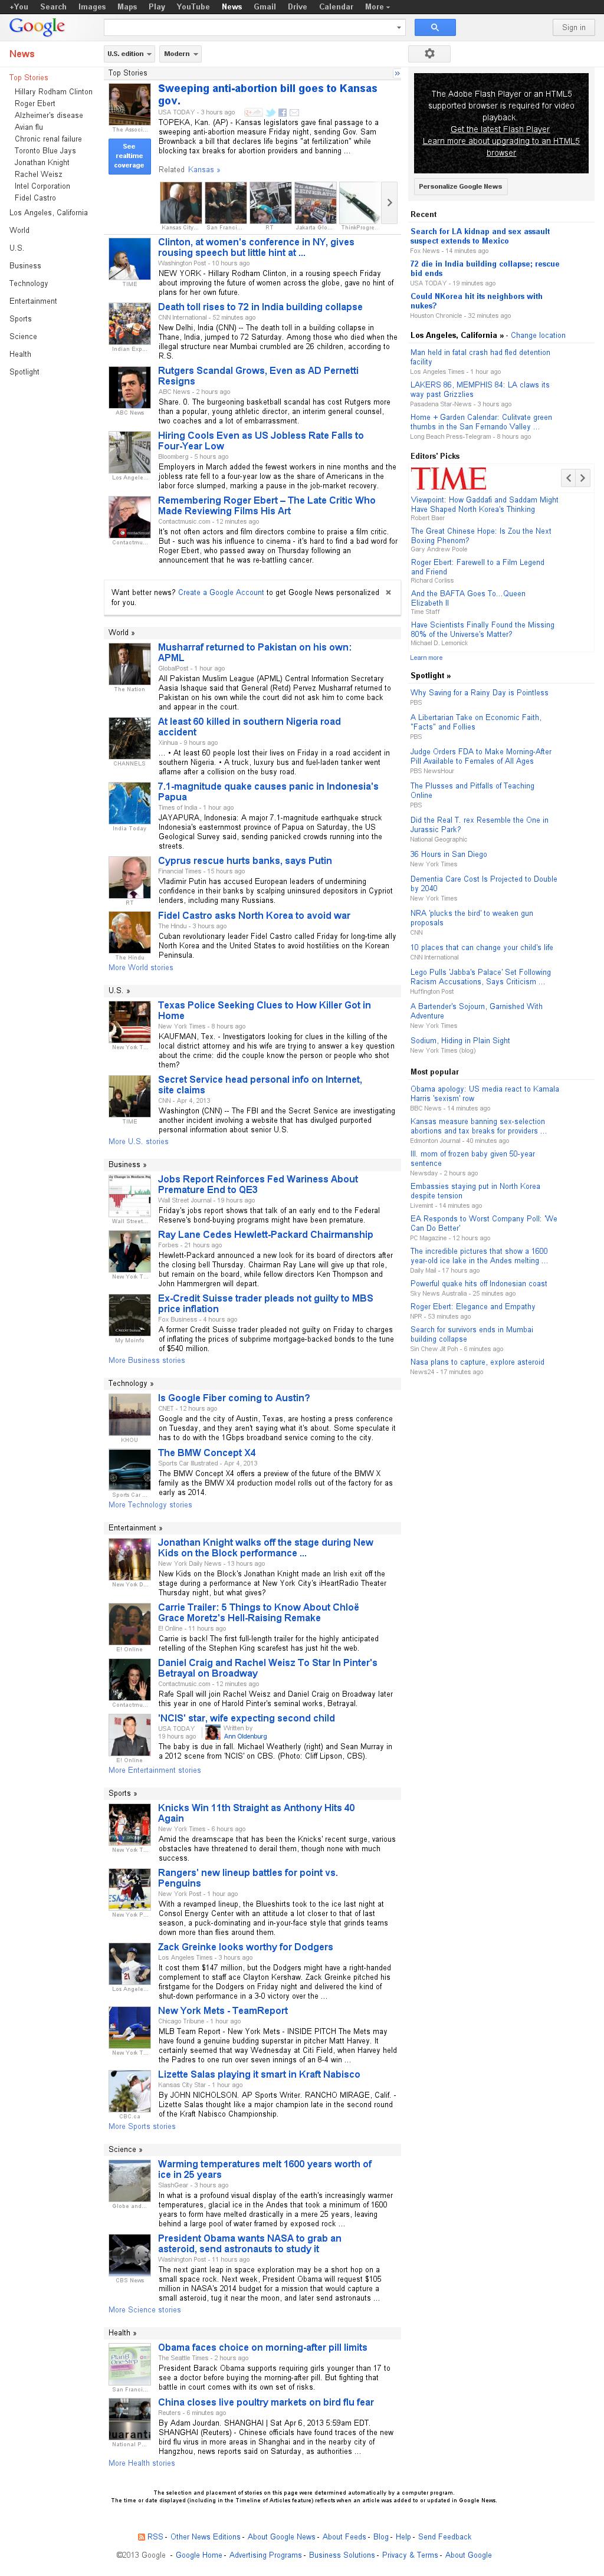 Google News at Saturday April 6, 2013, 10:07 a.m. UTC